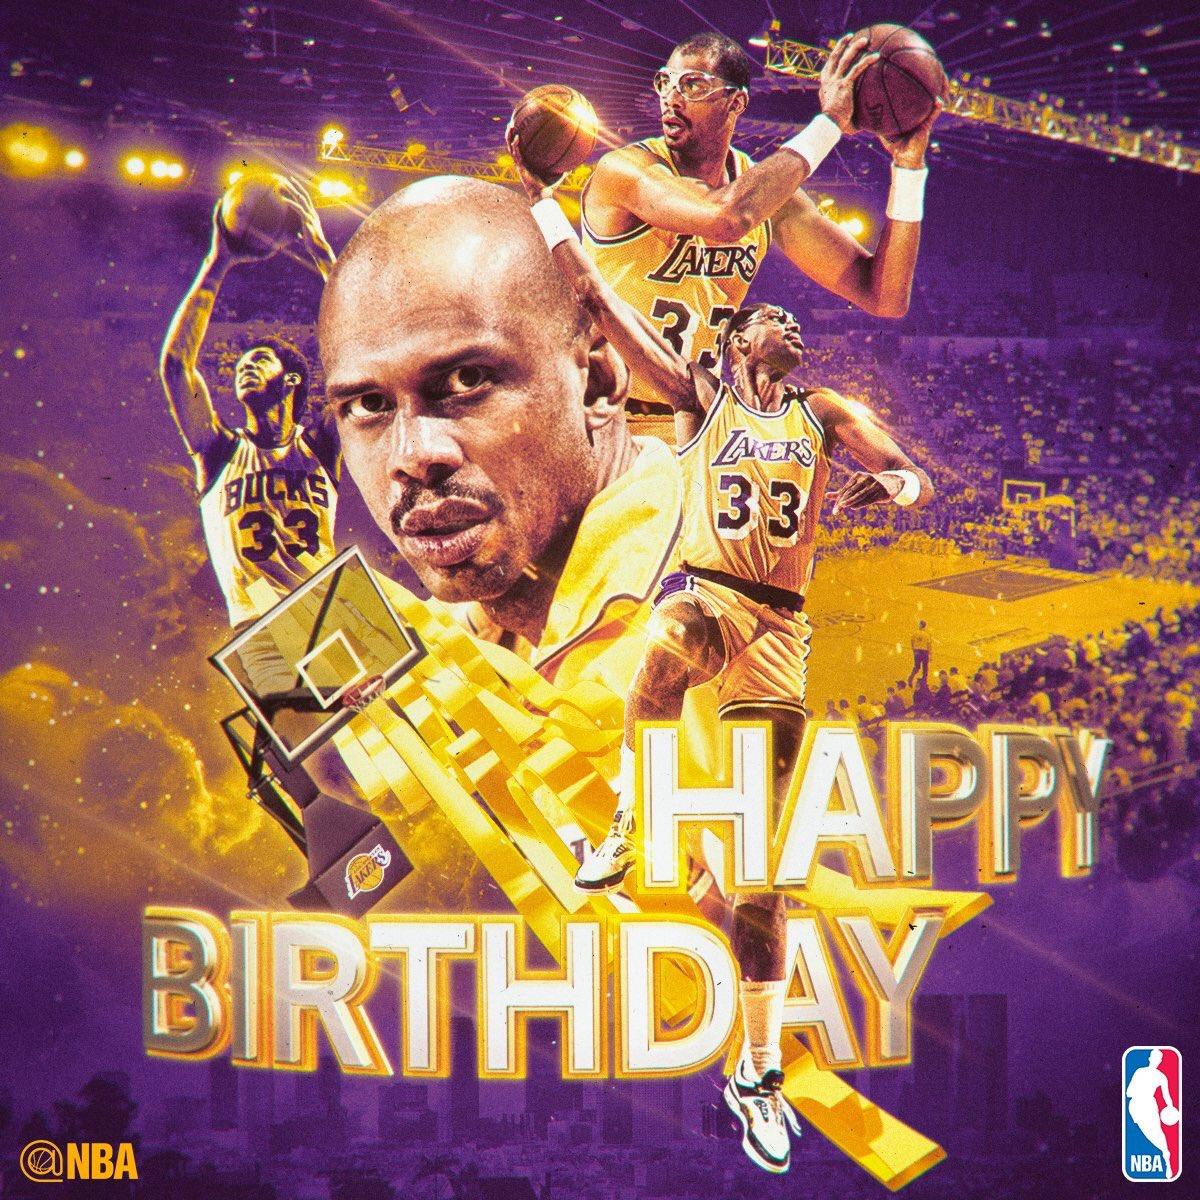 Happy Birthday to the 19-Time NBA All-Star, 6-Time NBA MVP, & 6-Time NBA Champion, Kareem Abdul-Jabbar!